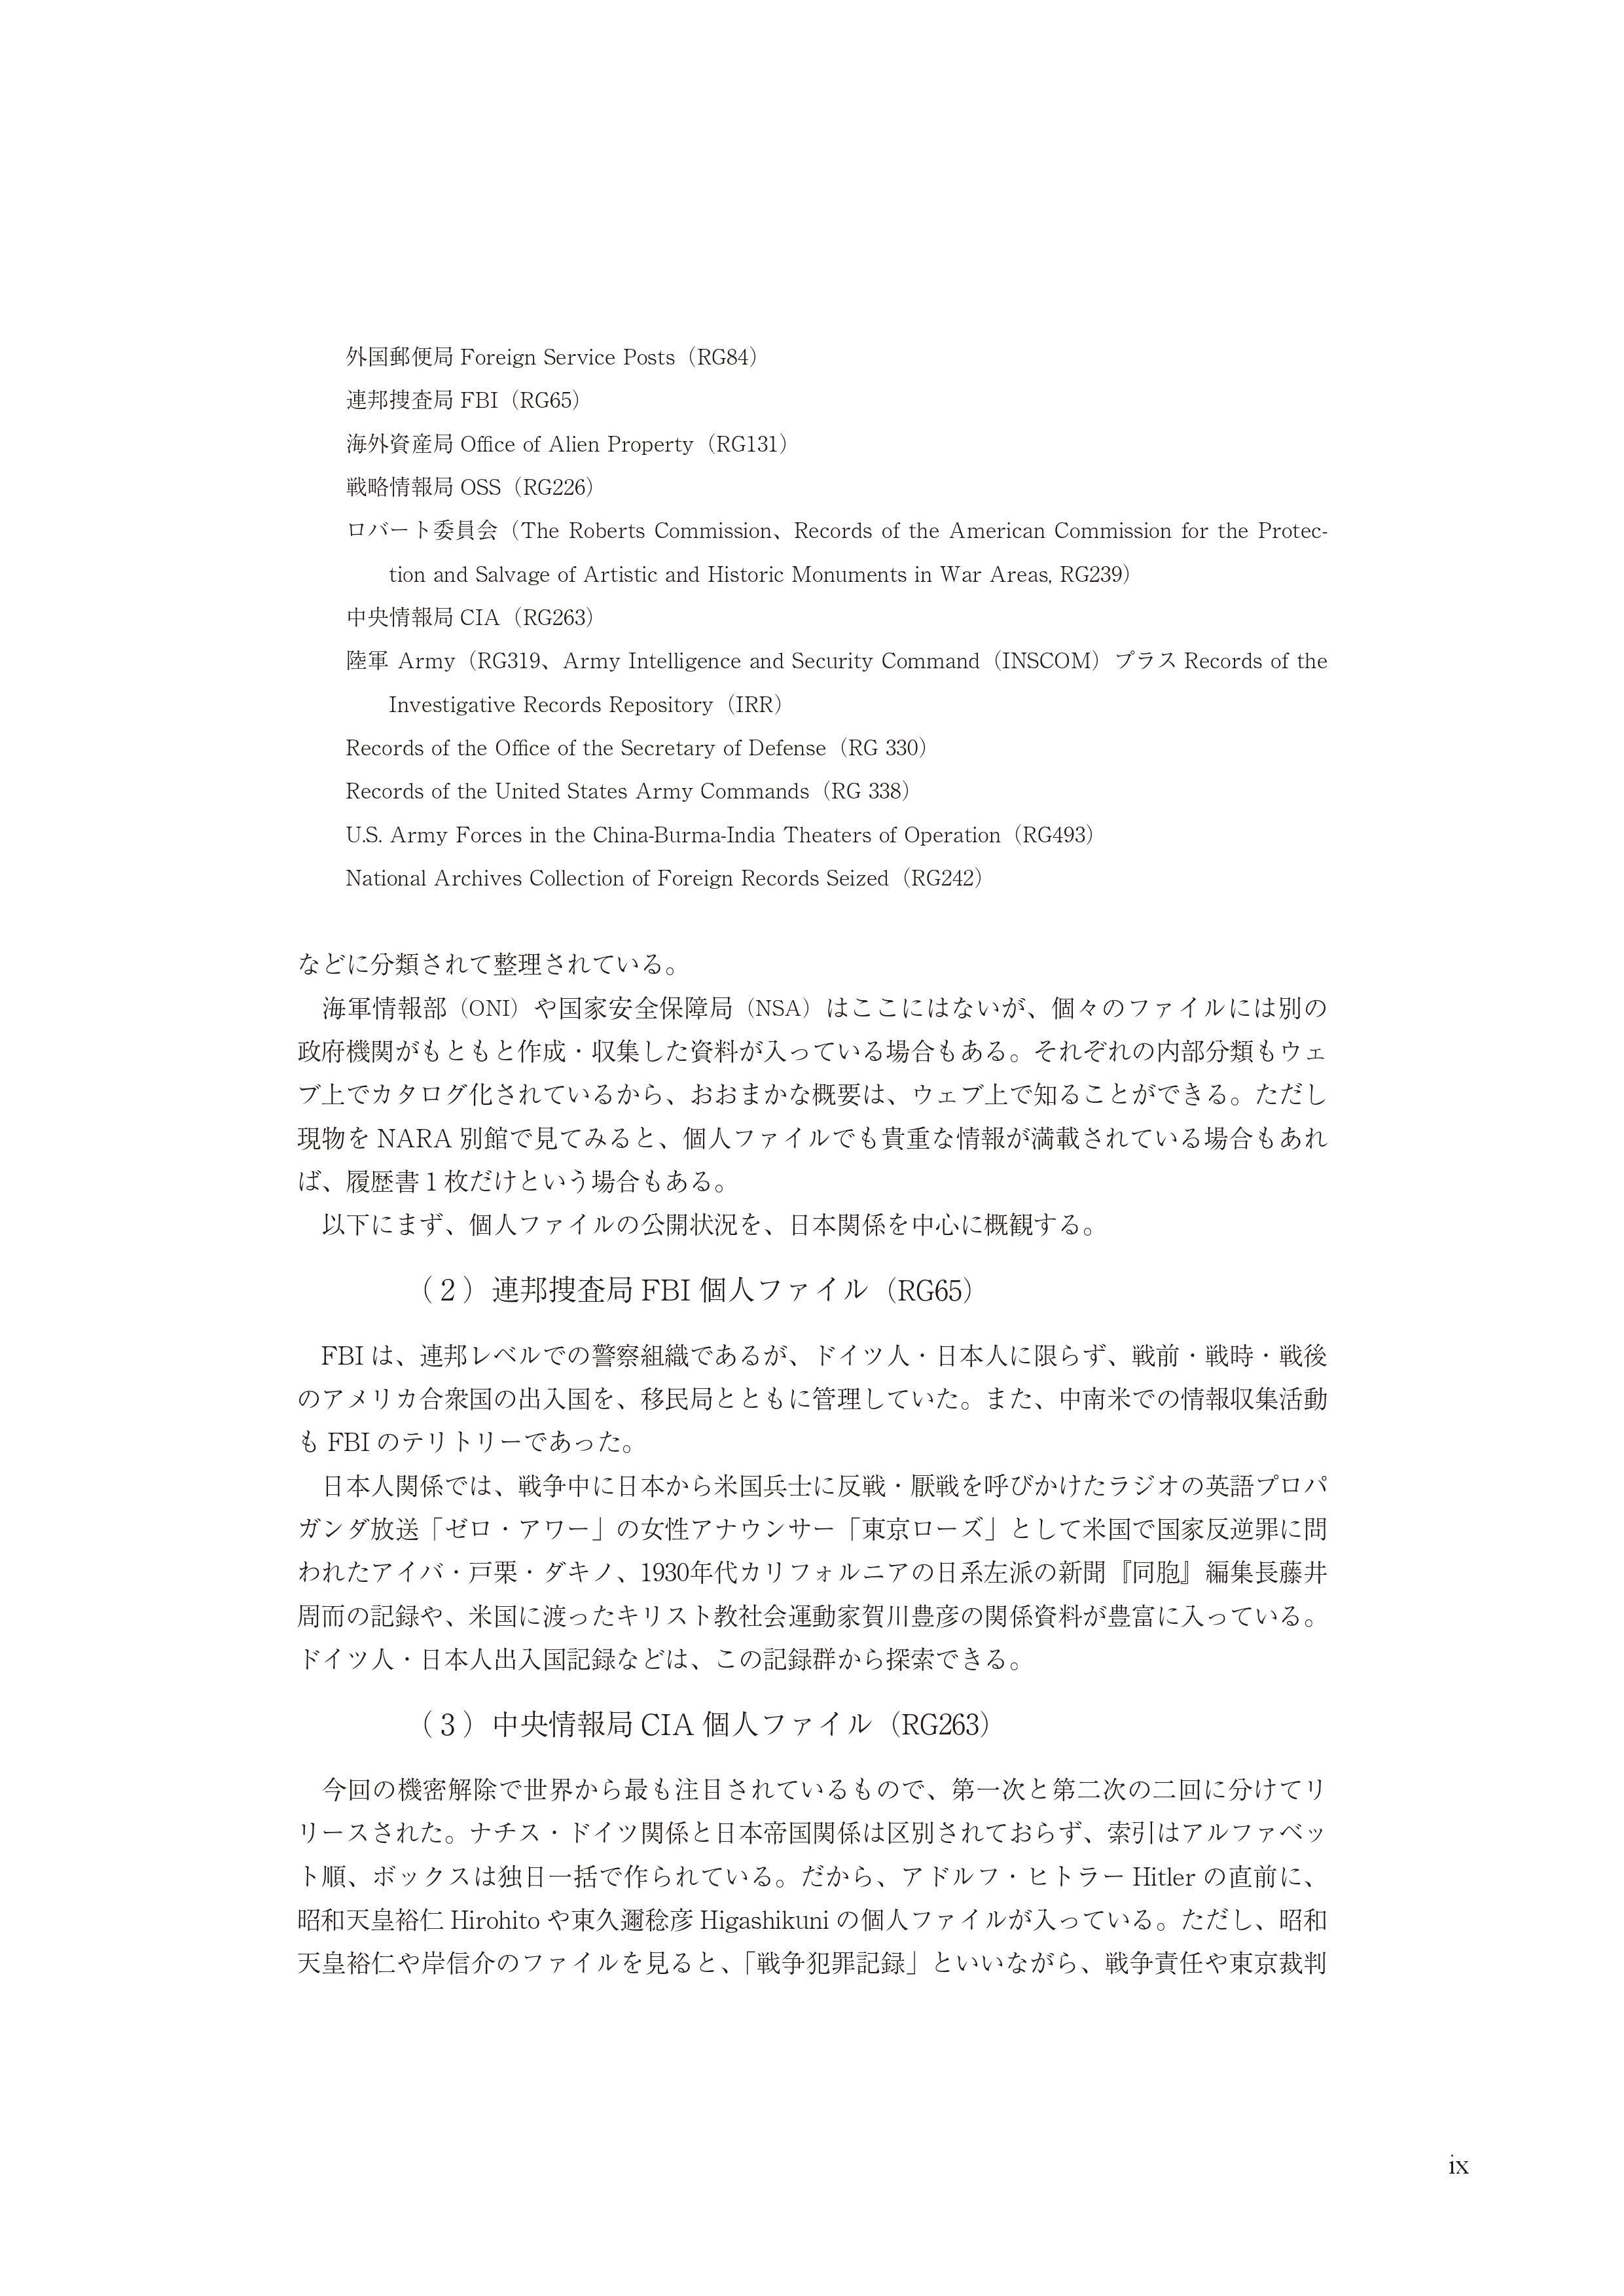 CIA日本人ファイル0001 (9)